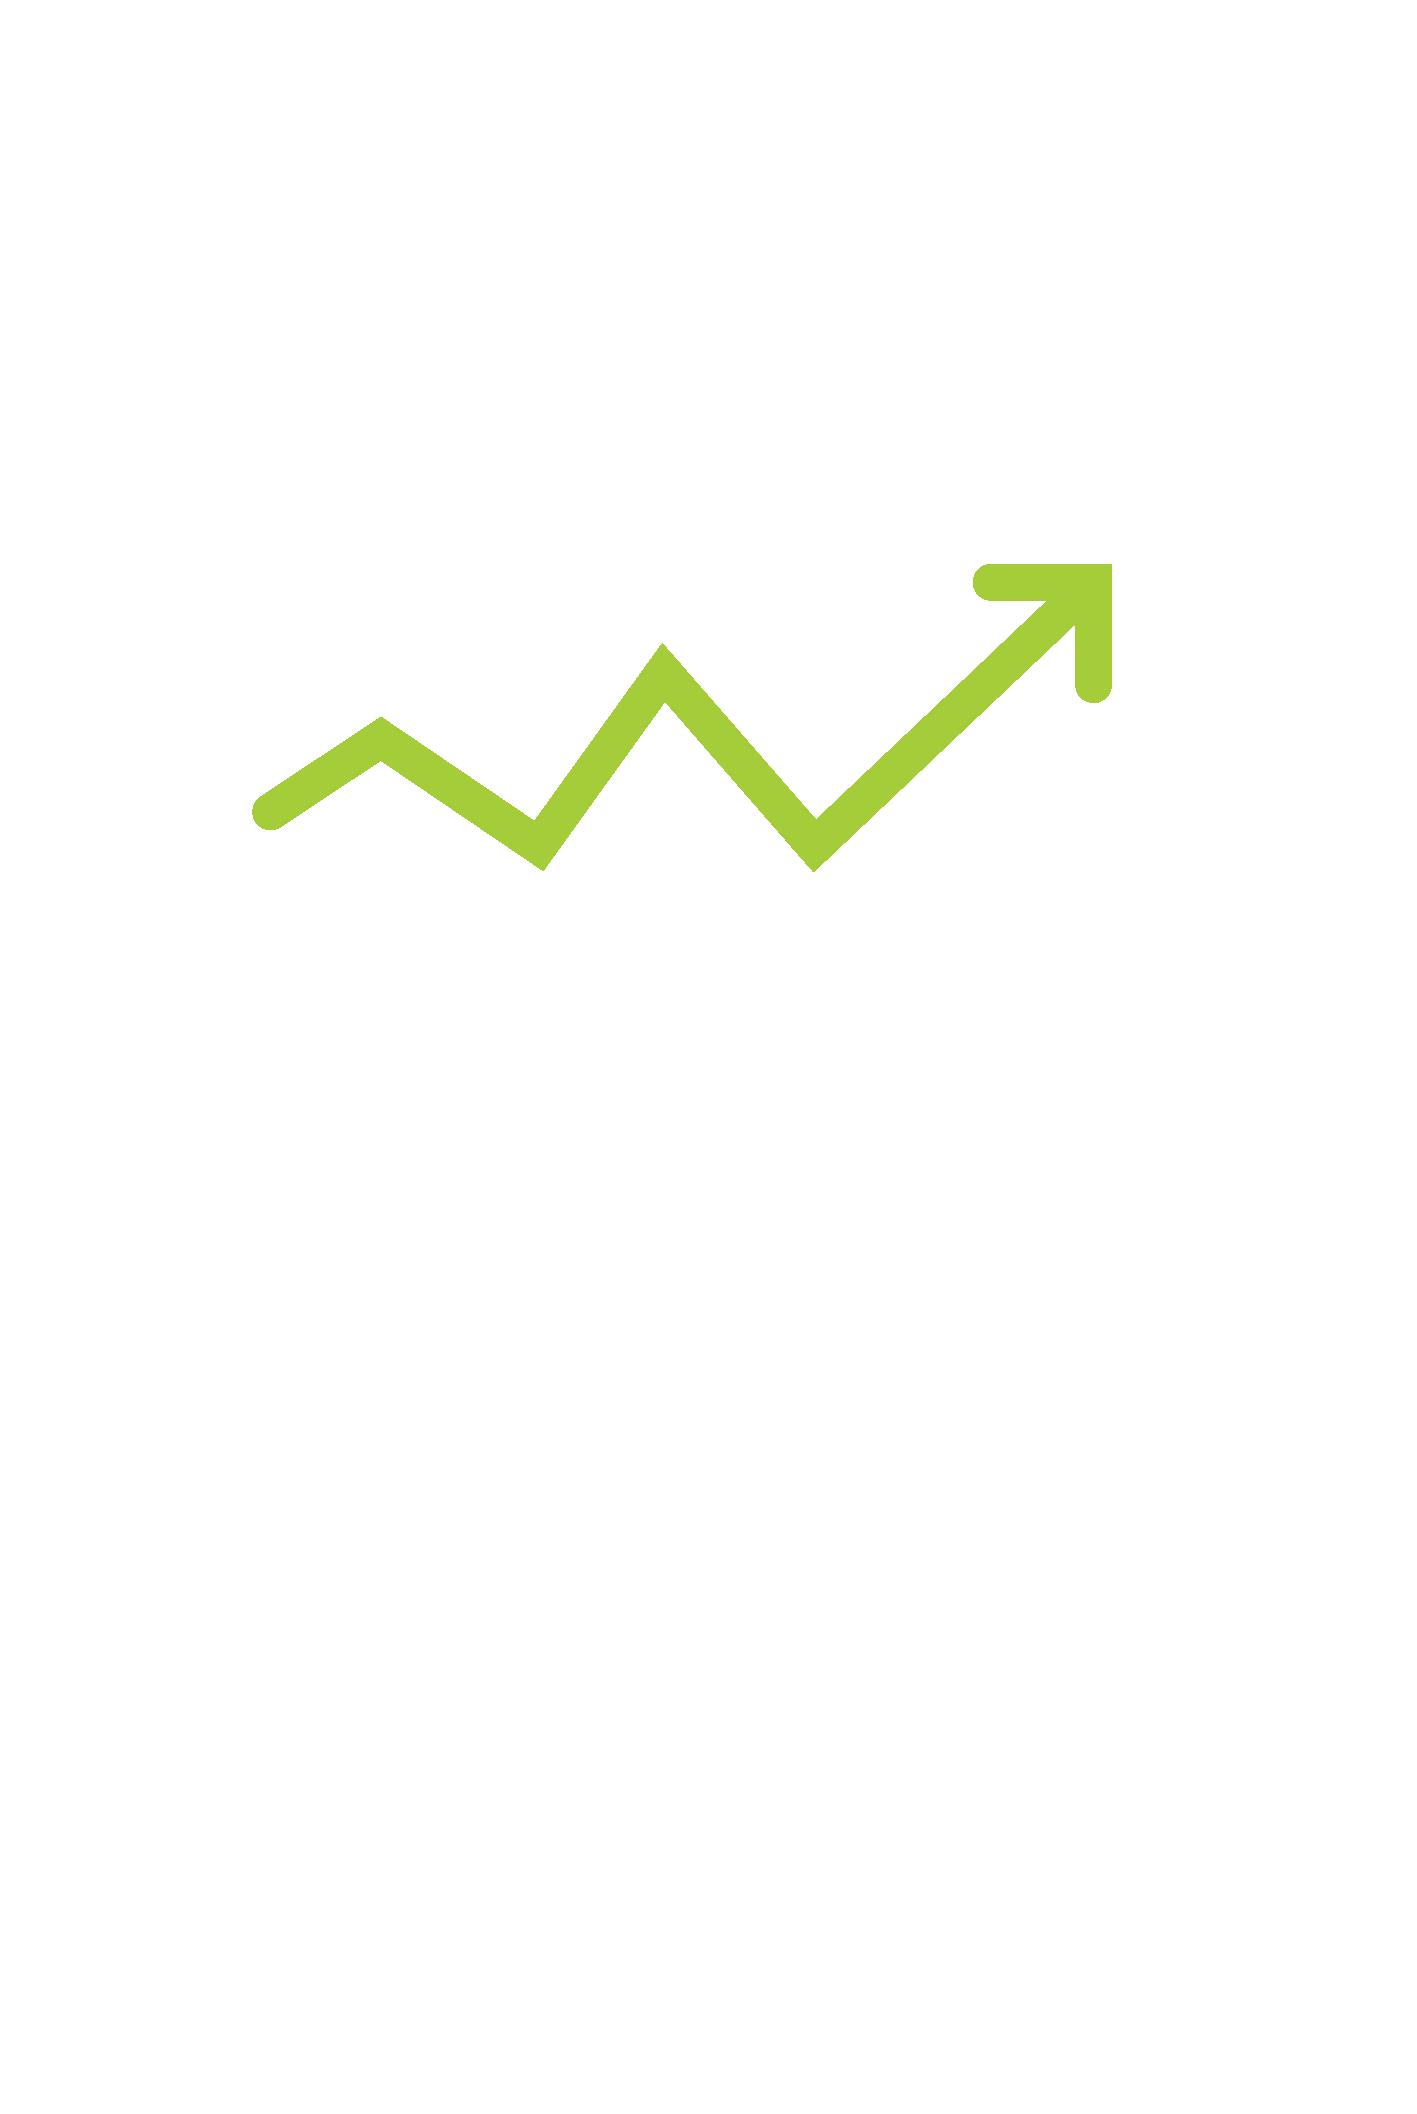 Performance Marketing - Biddable